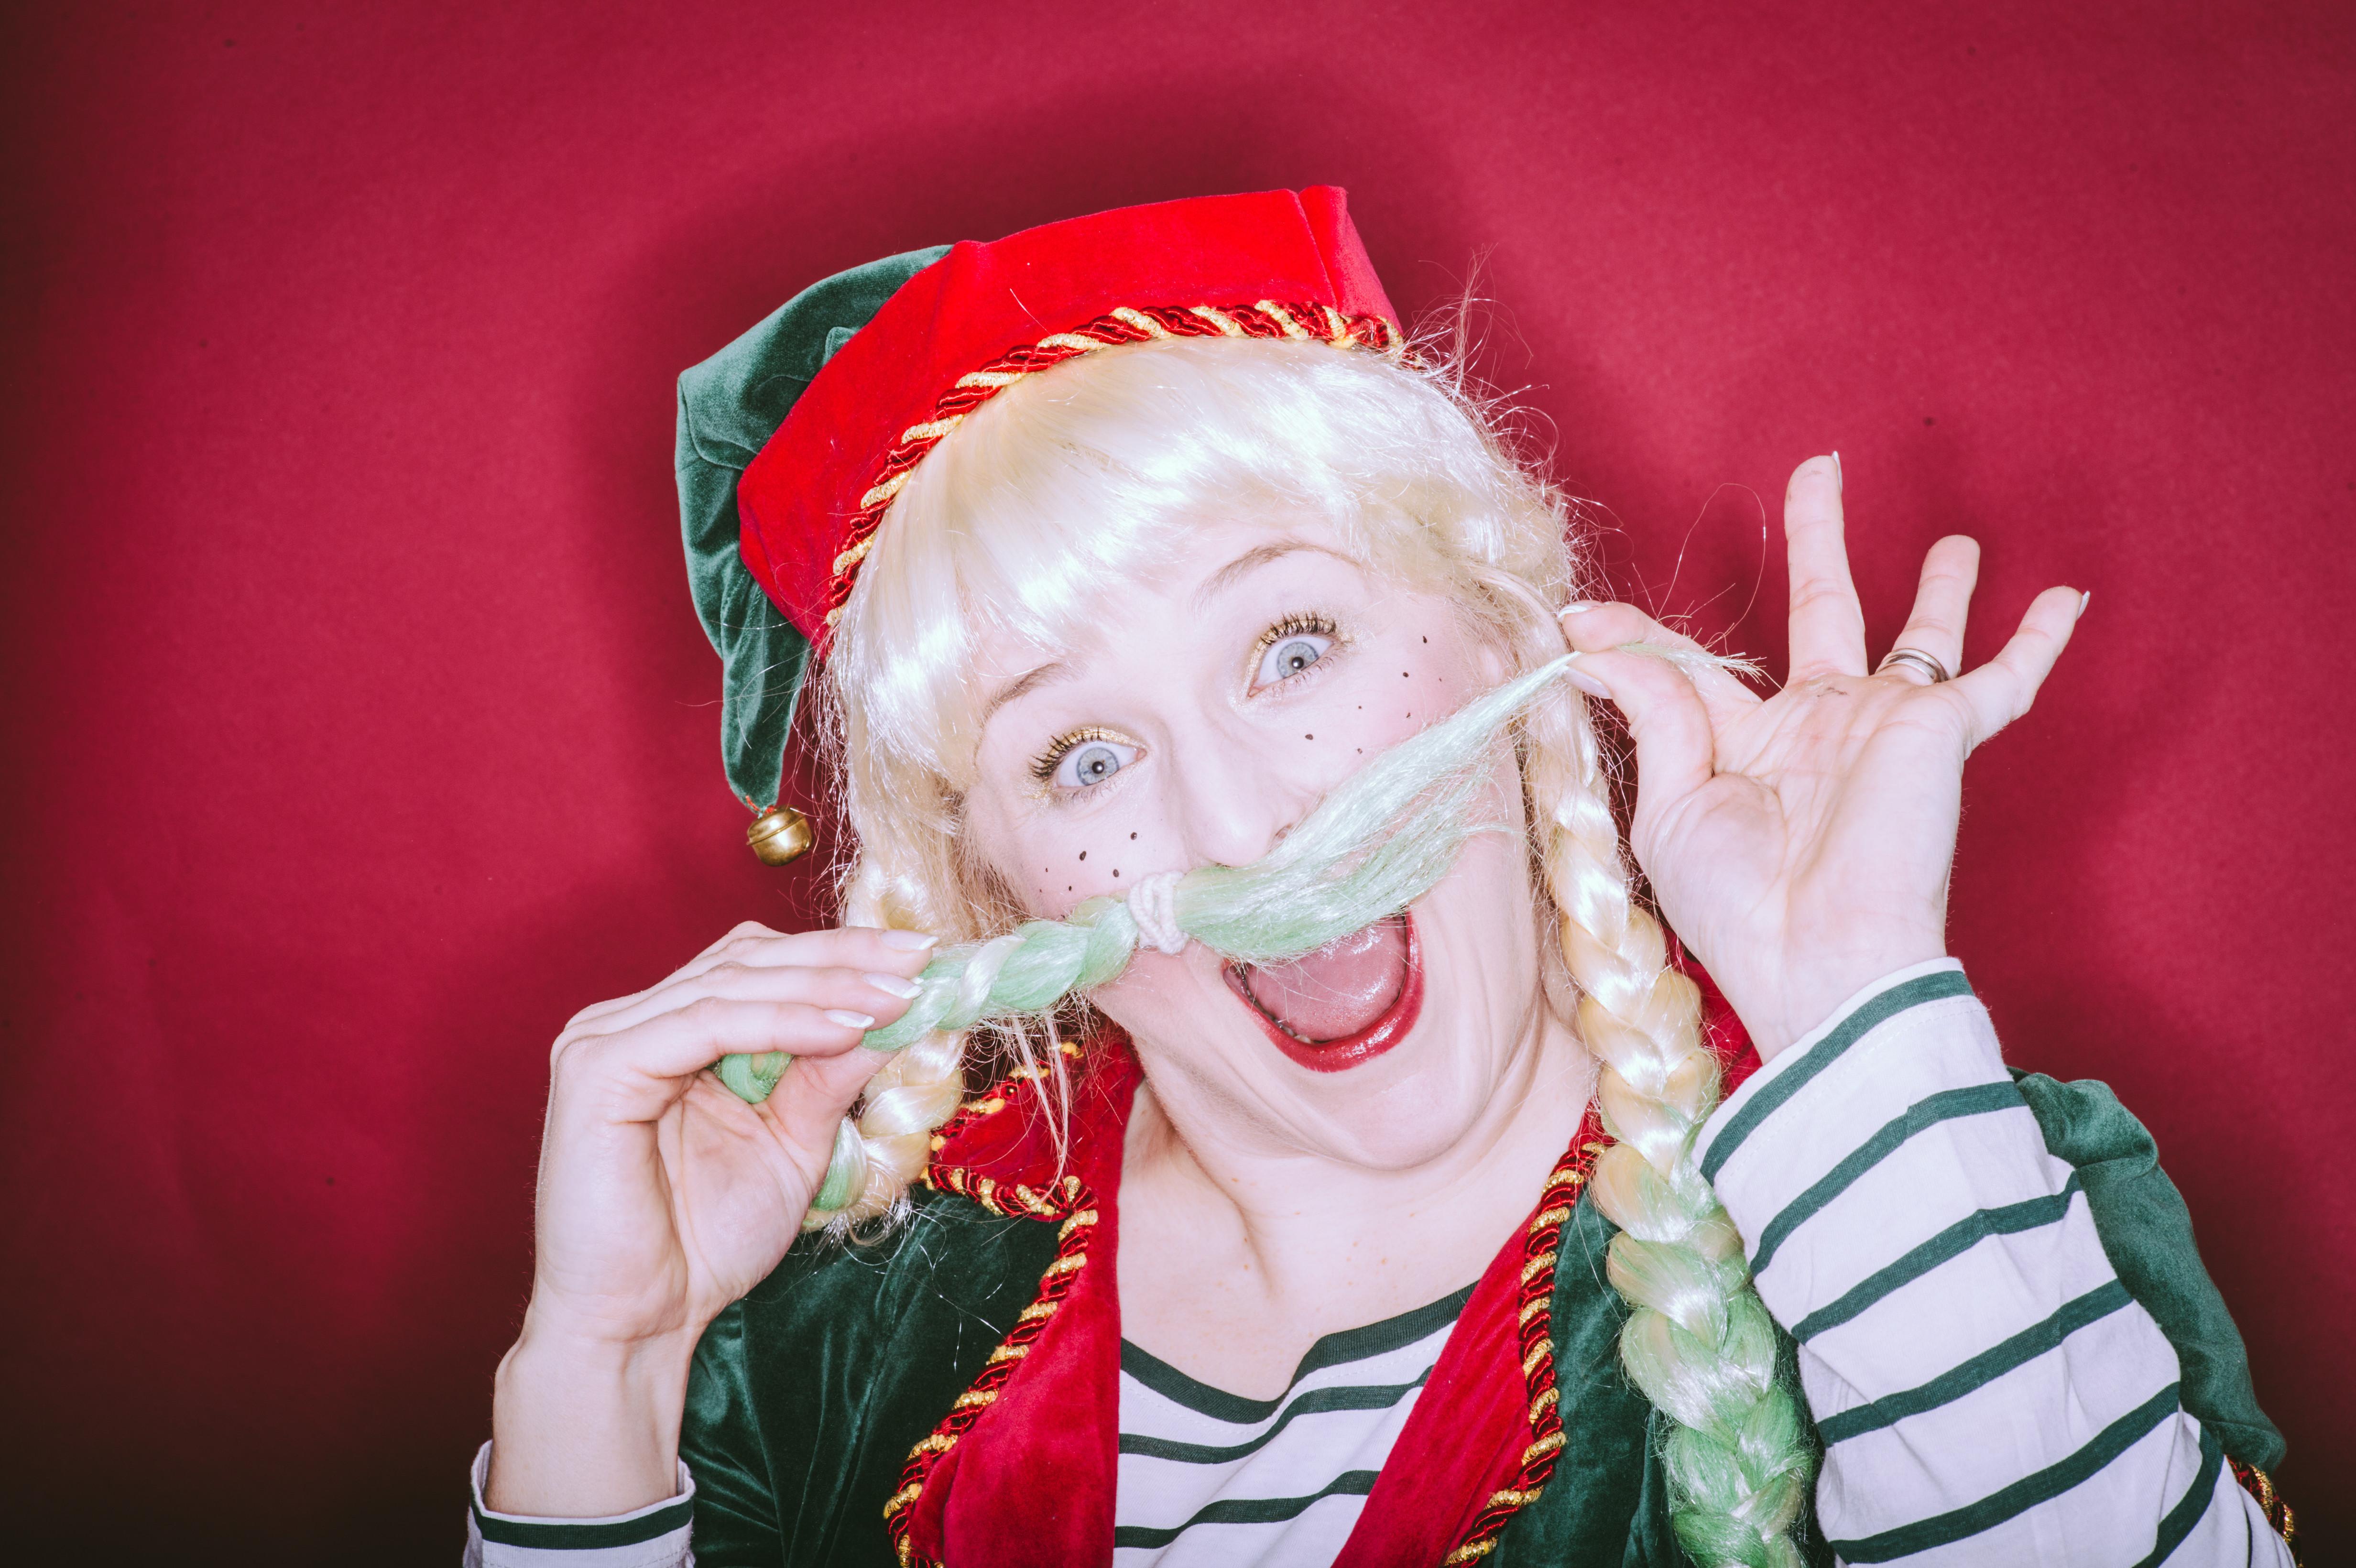 Pickle Bottom the Elf